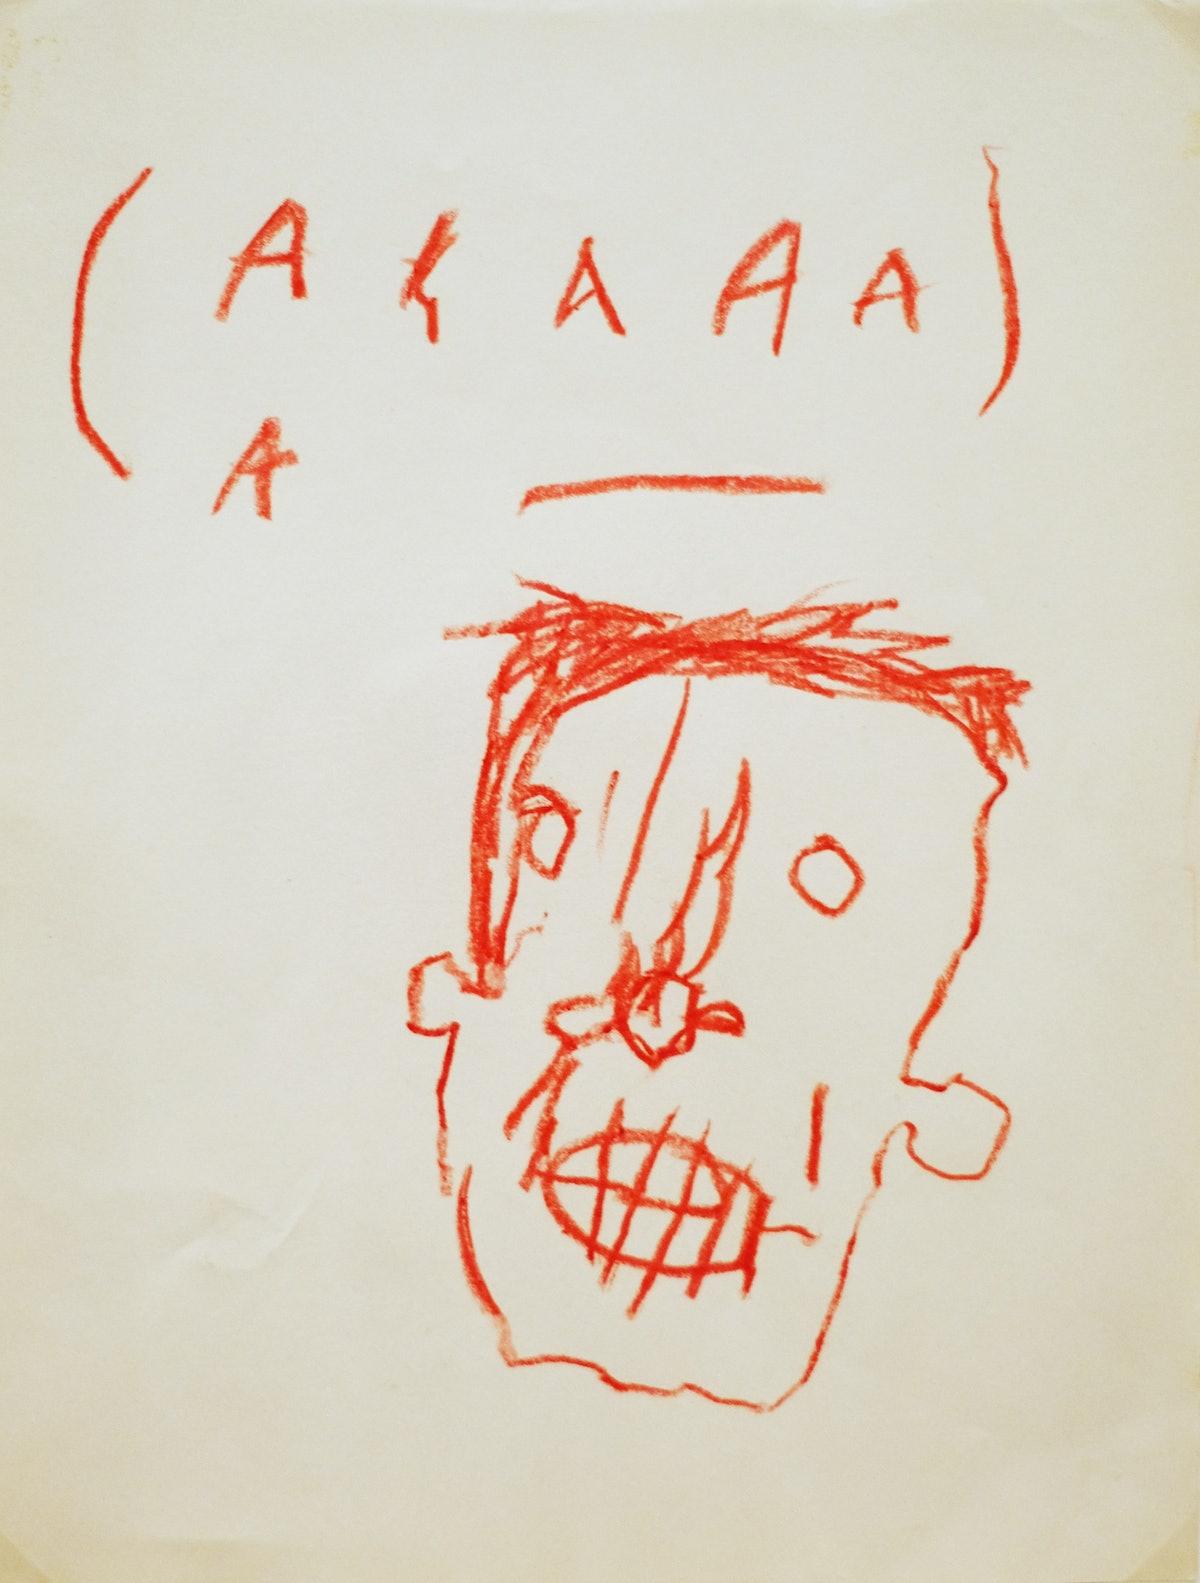 Basquiat_Untitled_Red Head with AAAA.jpg